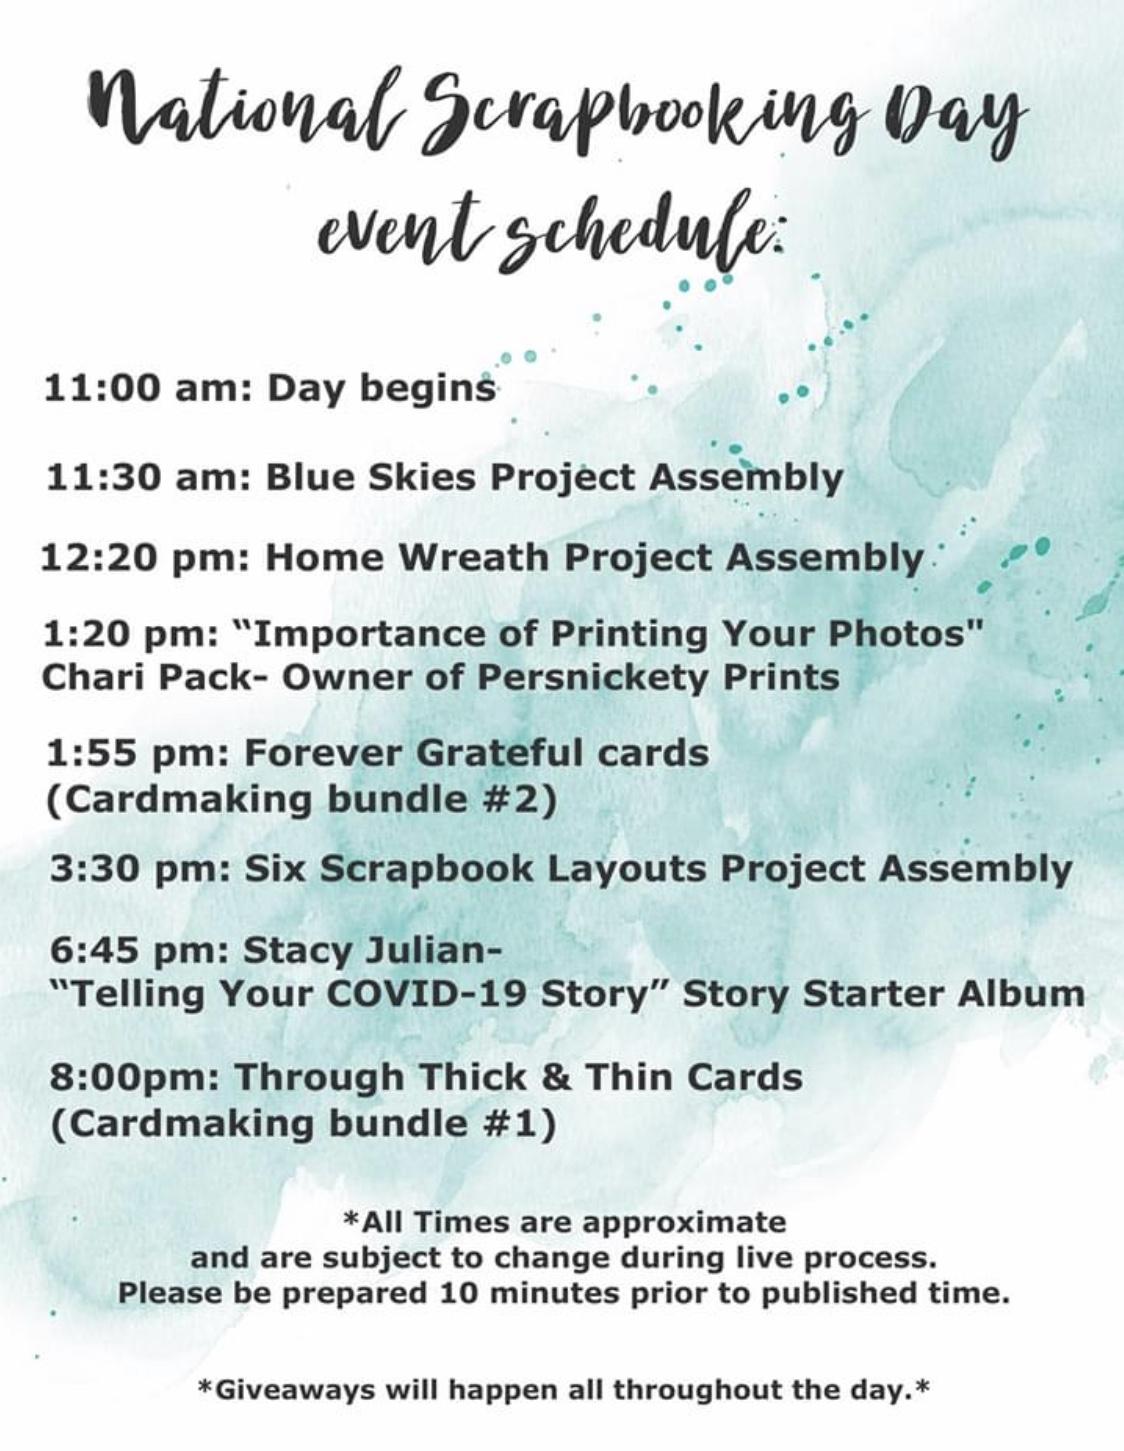 CTMH National Scrapbooking Day Schedule